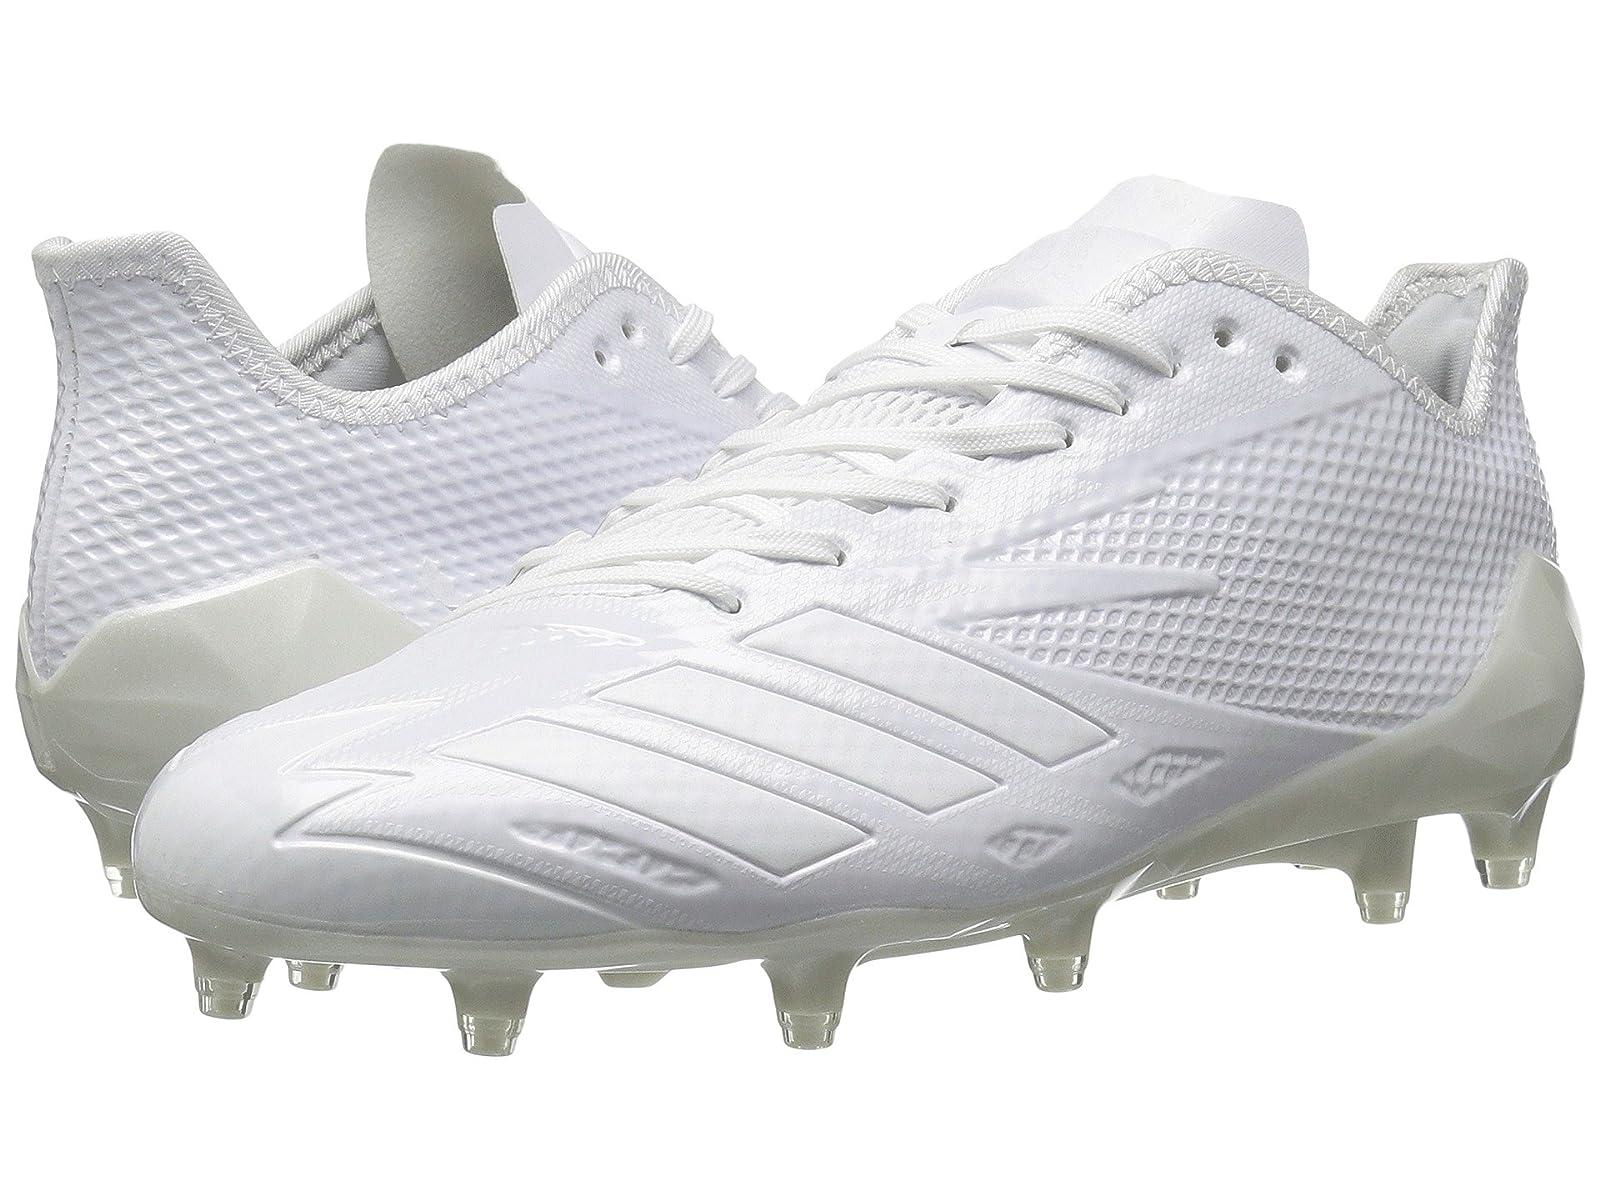 adidas Adizero 5-Star 6.0Stylish and characteristic shoes